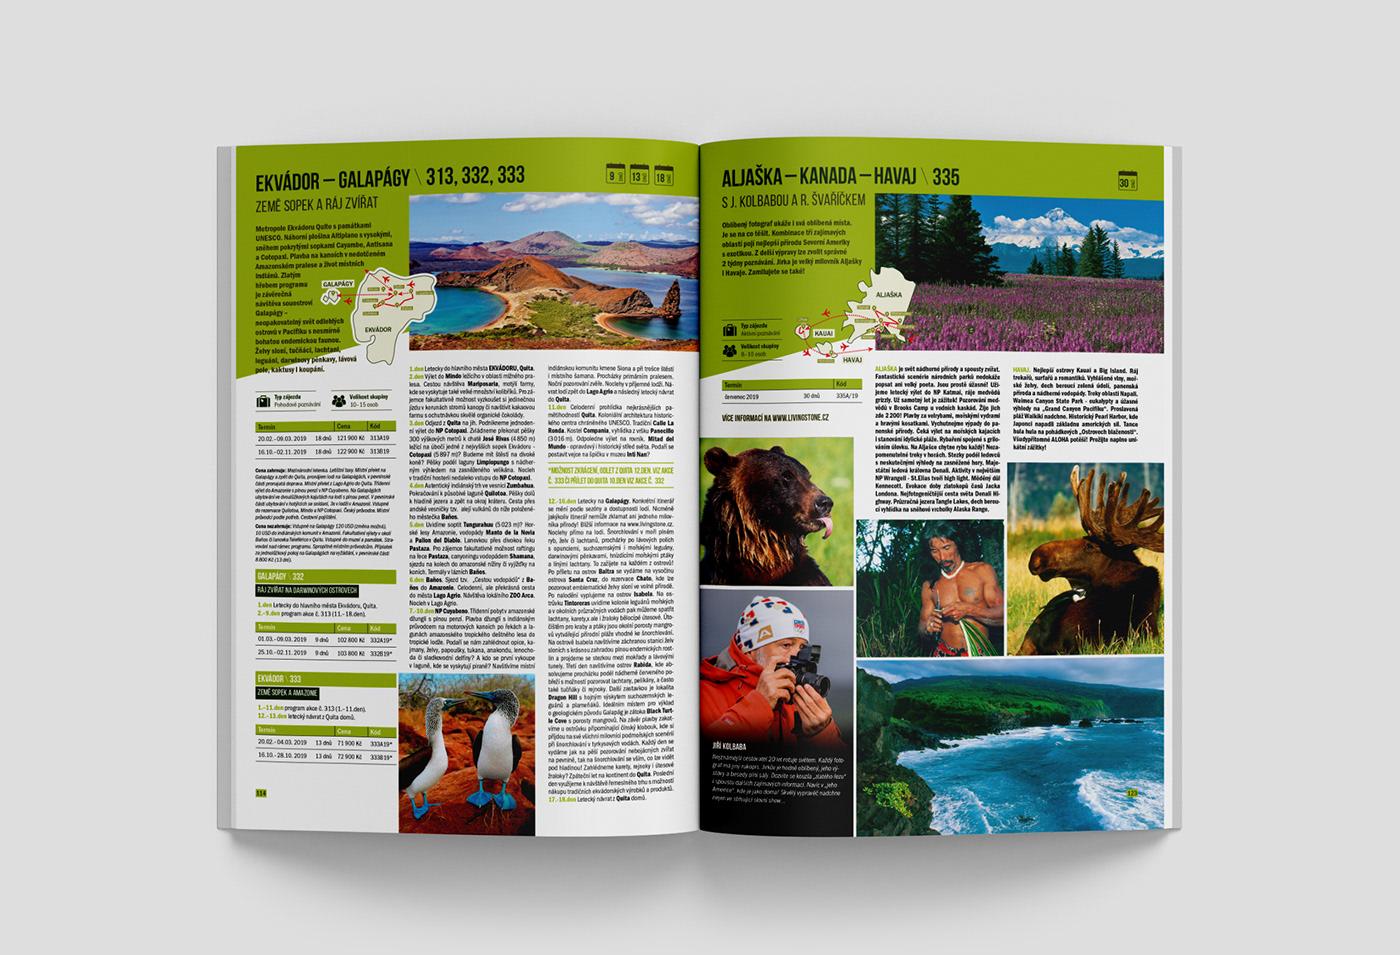 catalog david navratil design exotic livingstone print Travel travel agency Younick